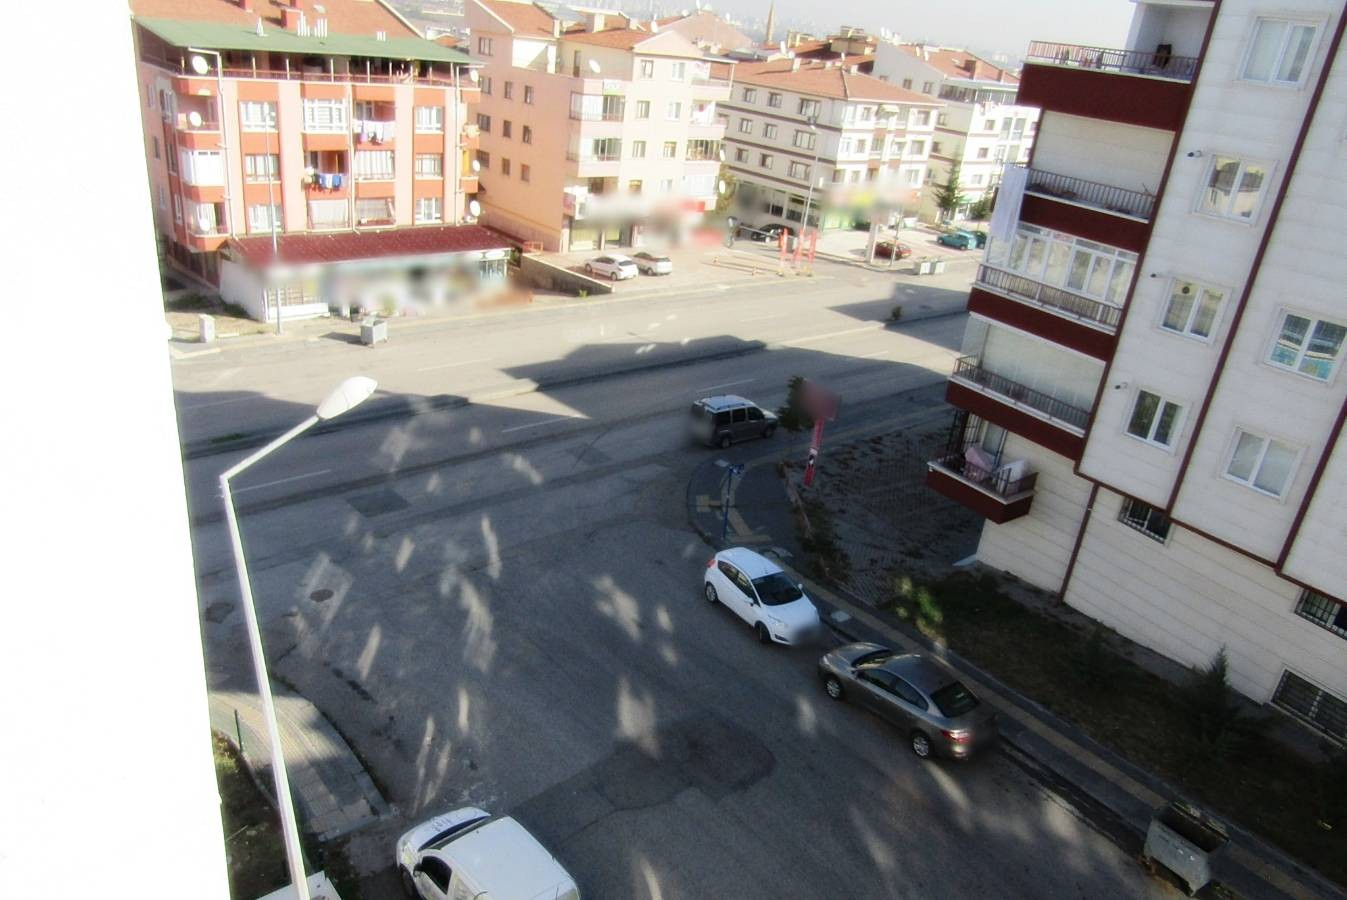 SR EMLAK'TAN SÜVARİ MAH'DE 4+1 200m² TRENE YAKIN YALITIMLI TERAS